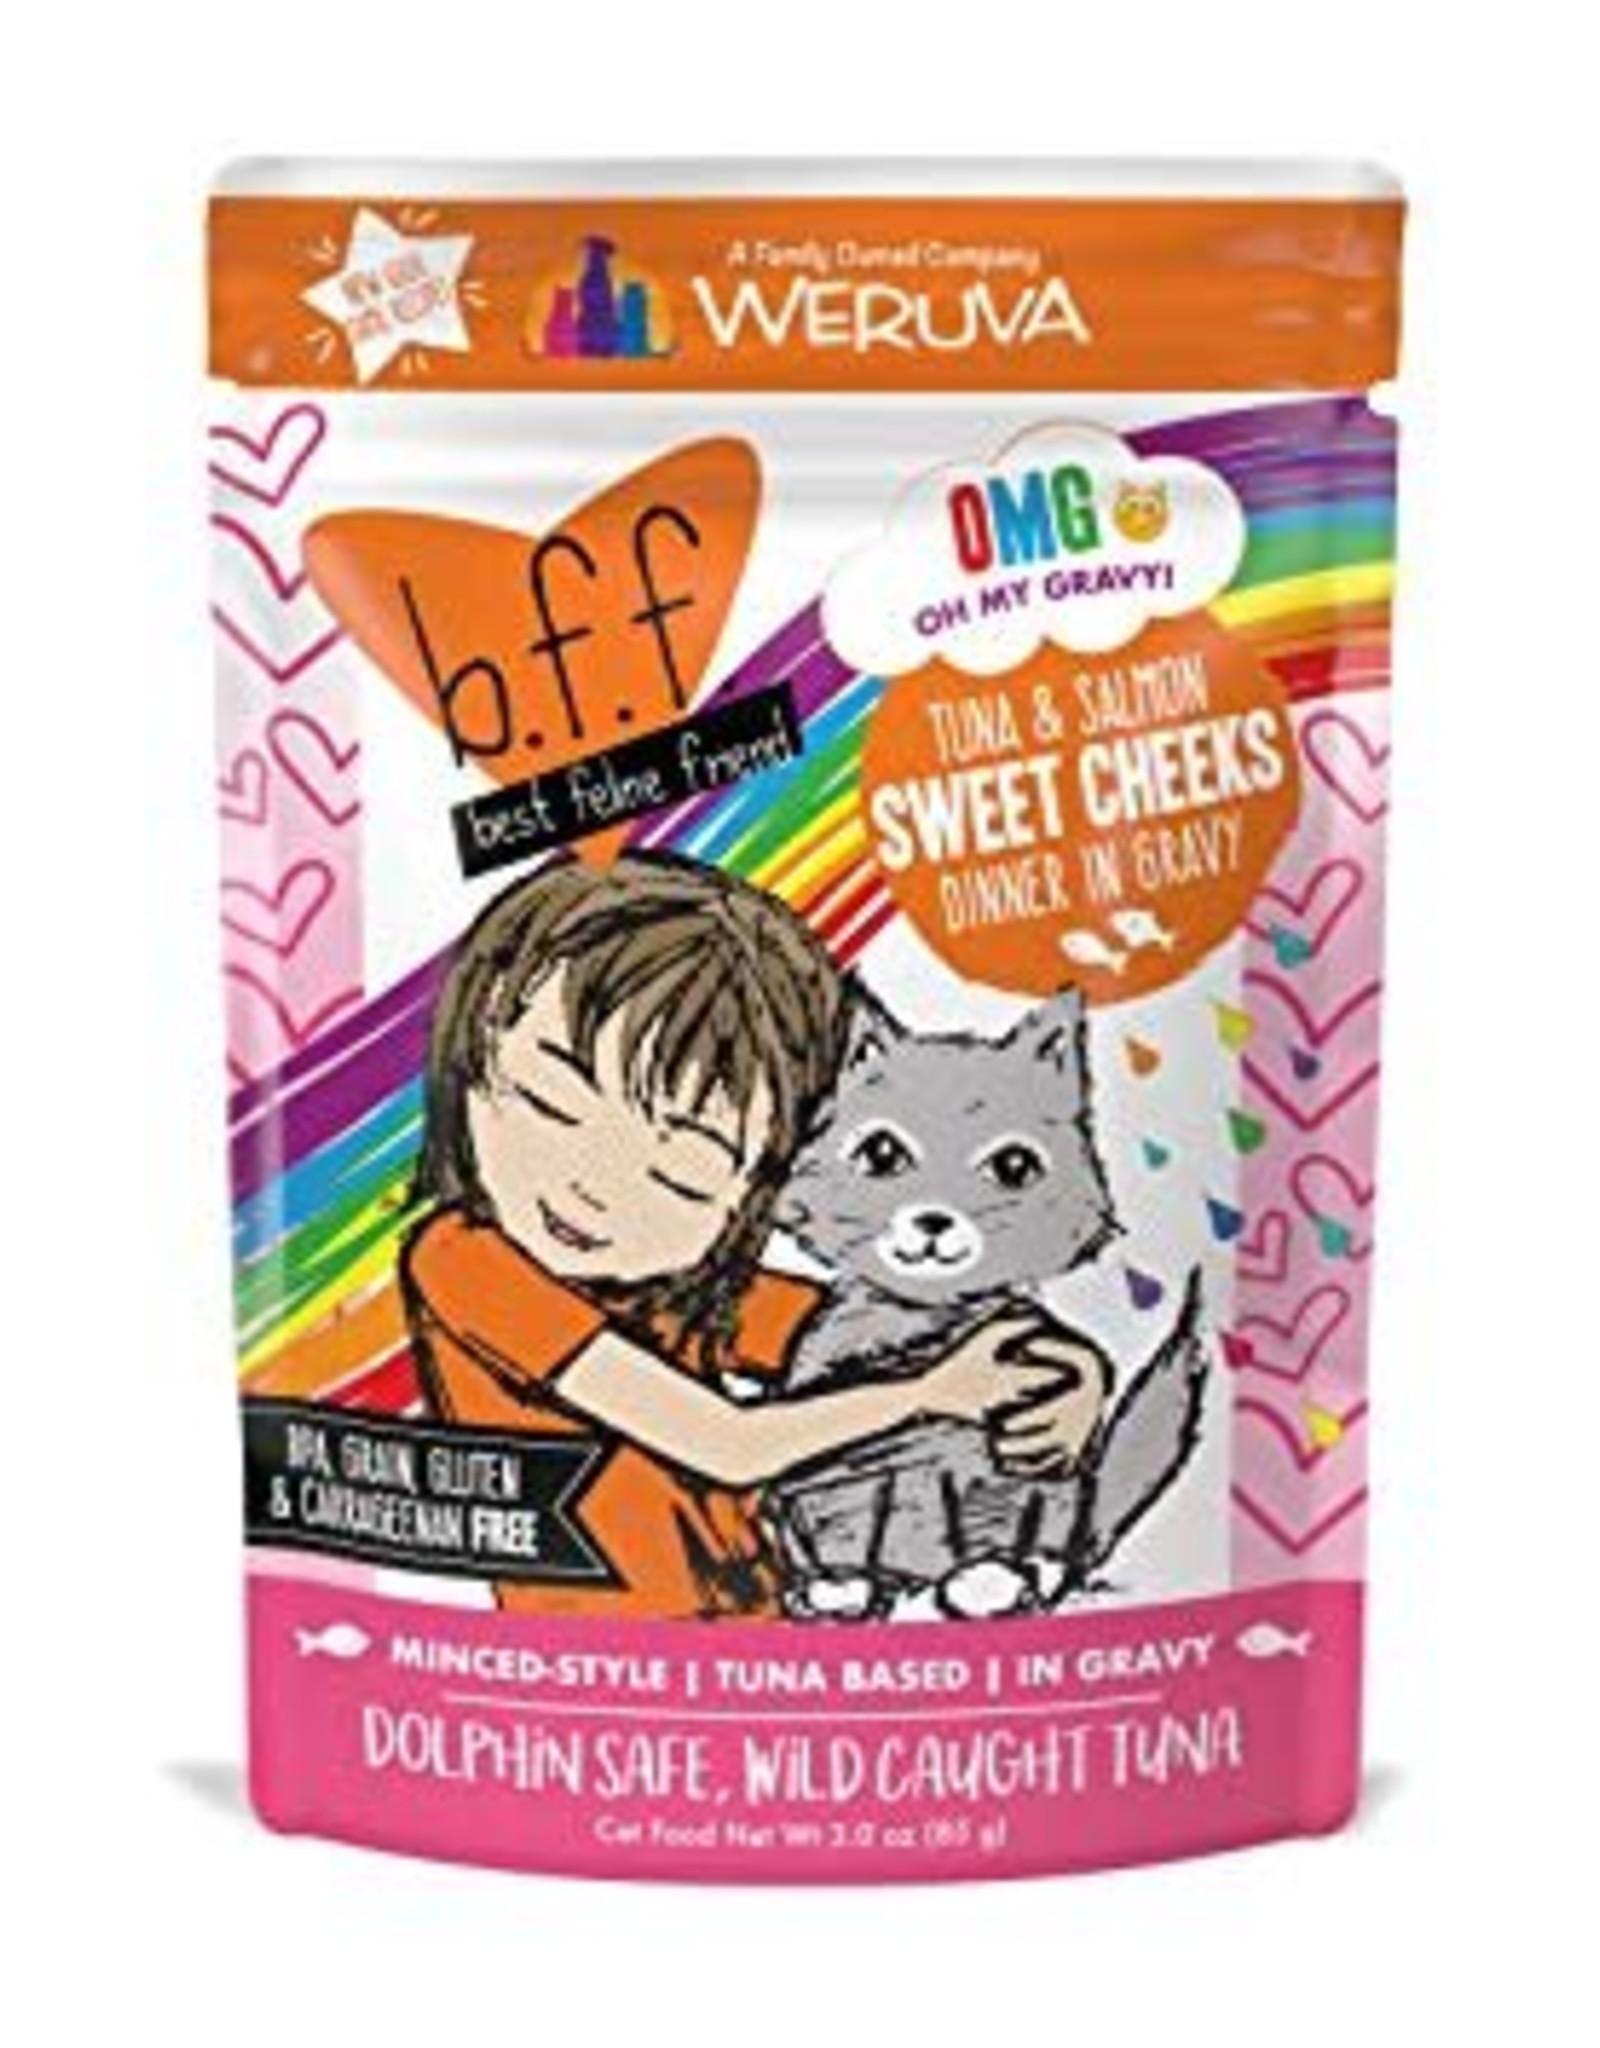 Weruva BFF OMG Tuna & Salmon Sweet Cheeks Cat Food Pouch, 3 oz.